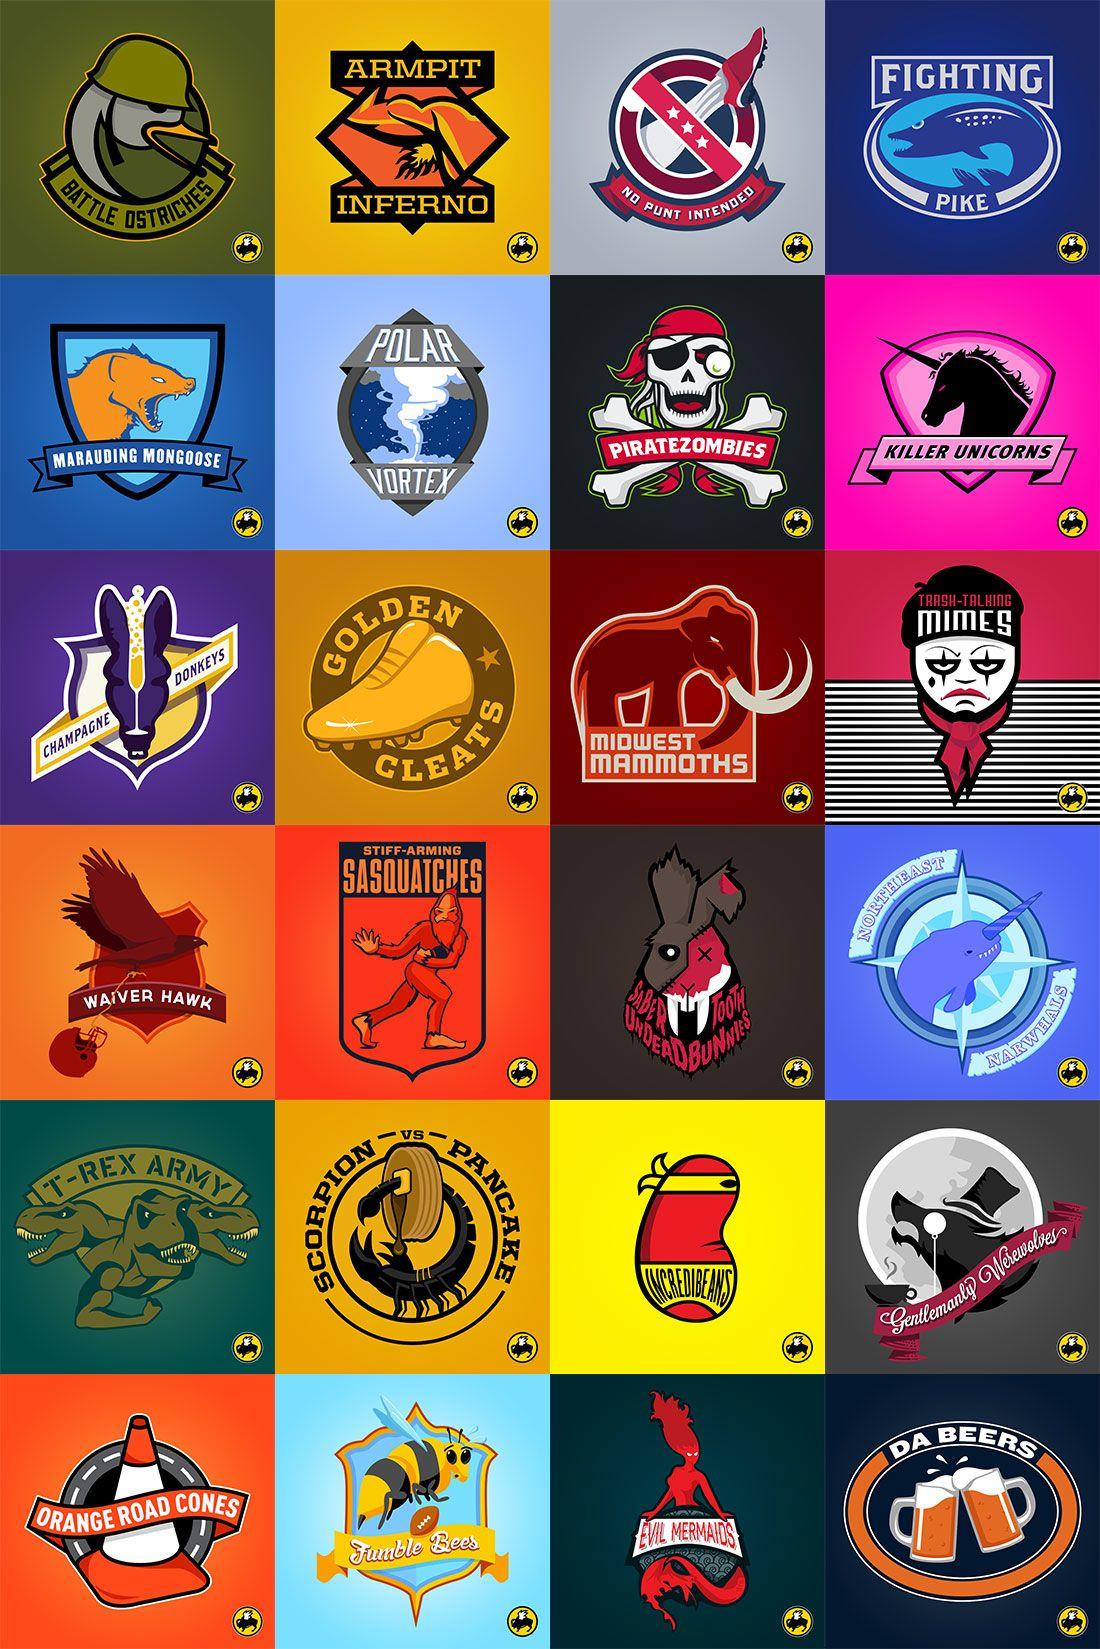 Fantasy Football Logos : fantasy, football, logos, PERISCOPE, Buffalo, Wings, Fantasy, Football, Logos, Logos,, Logo,